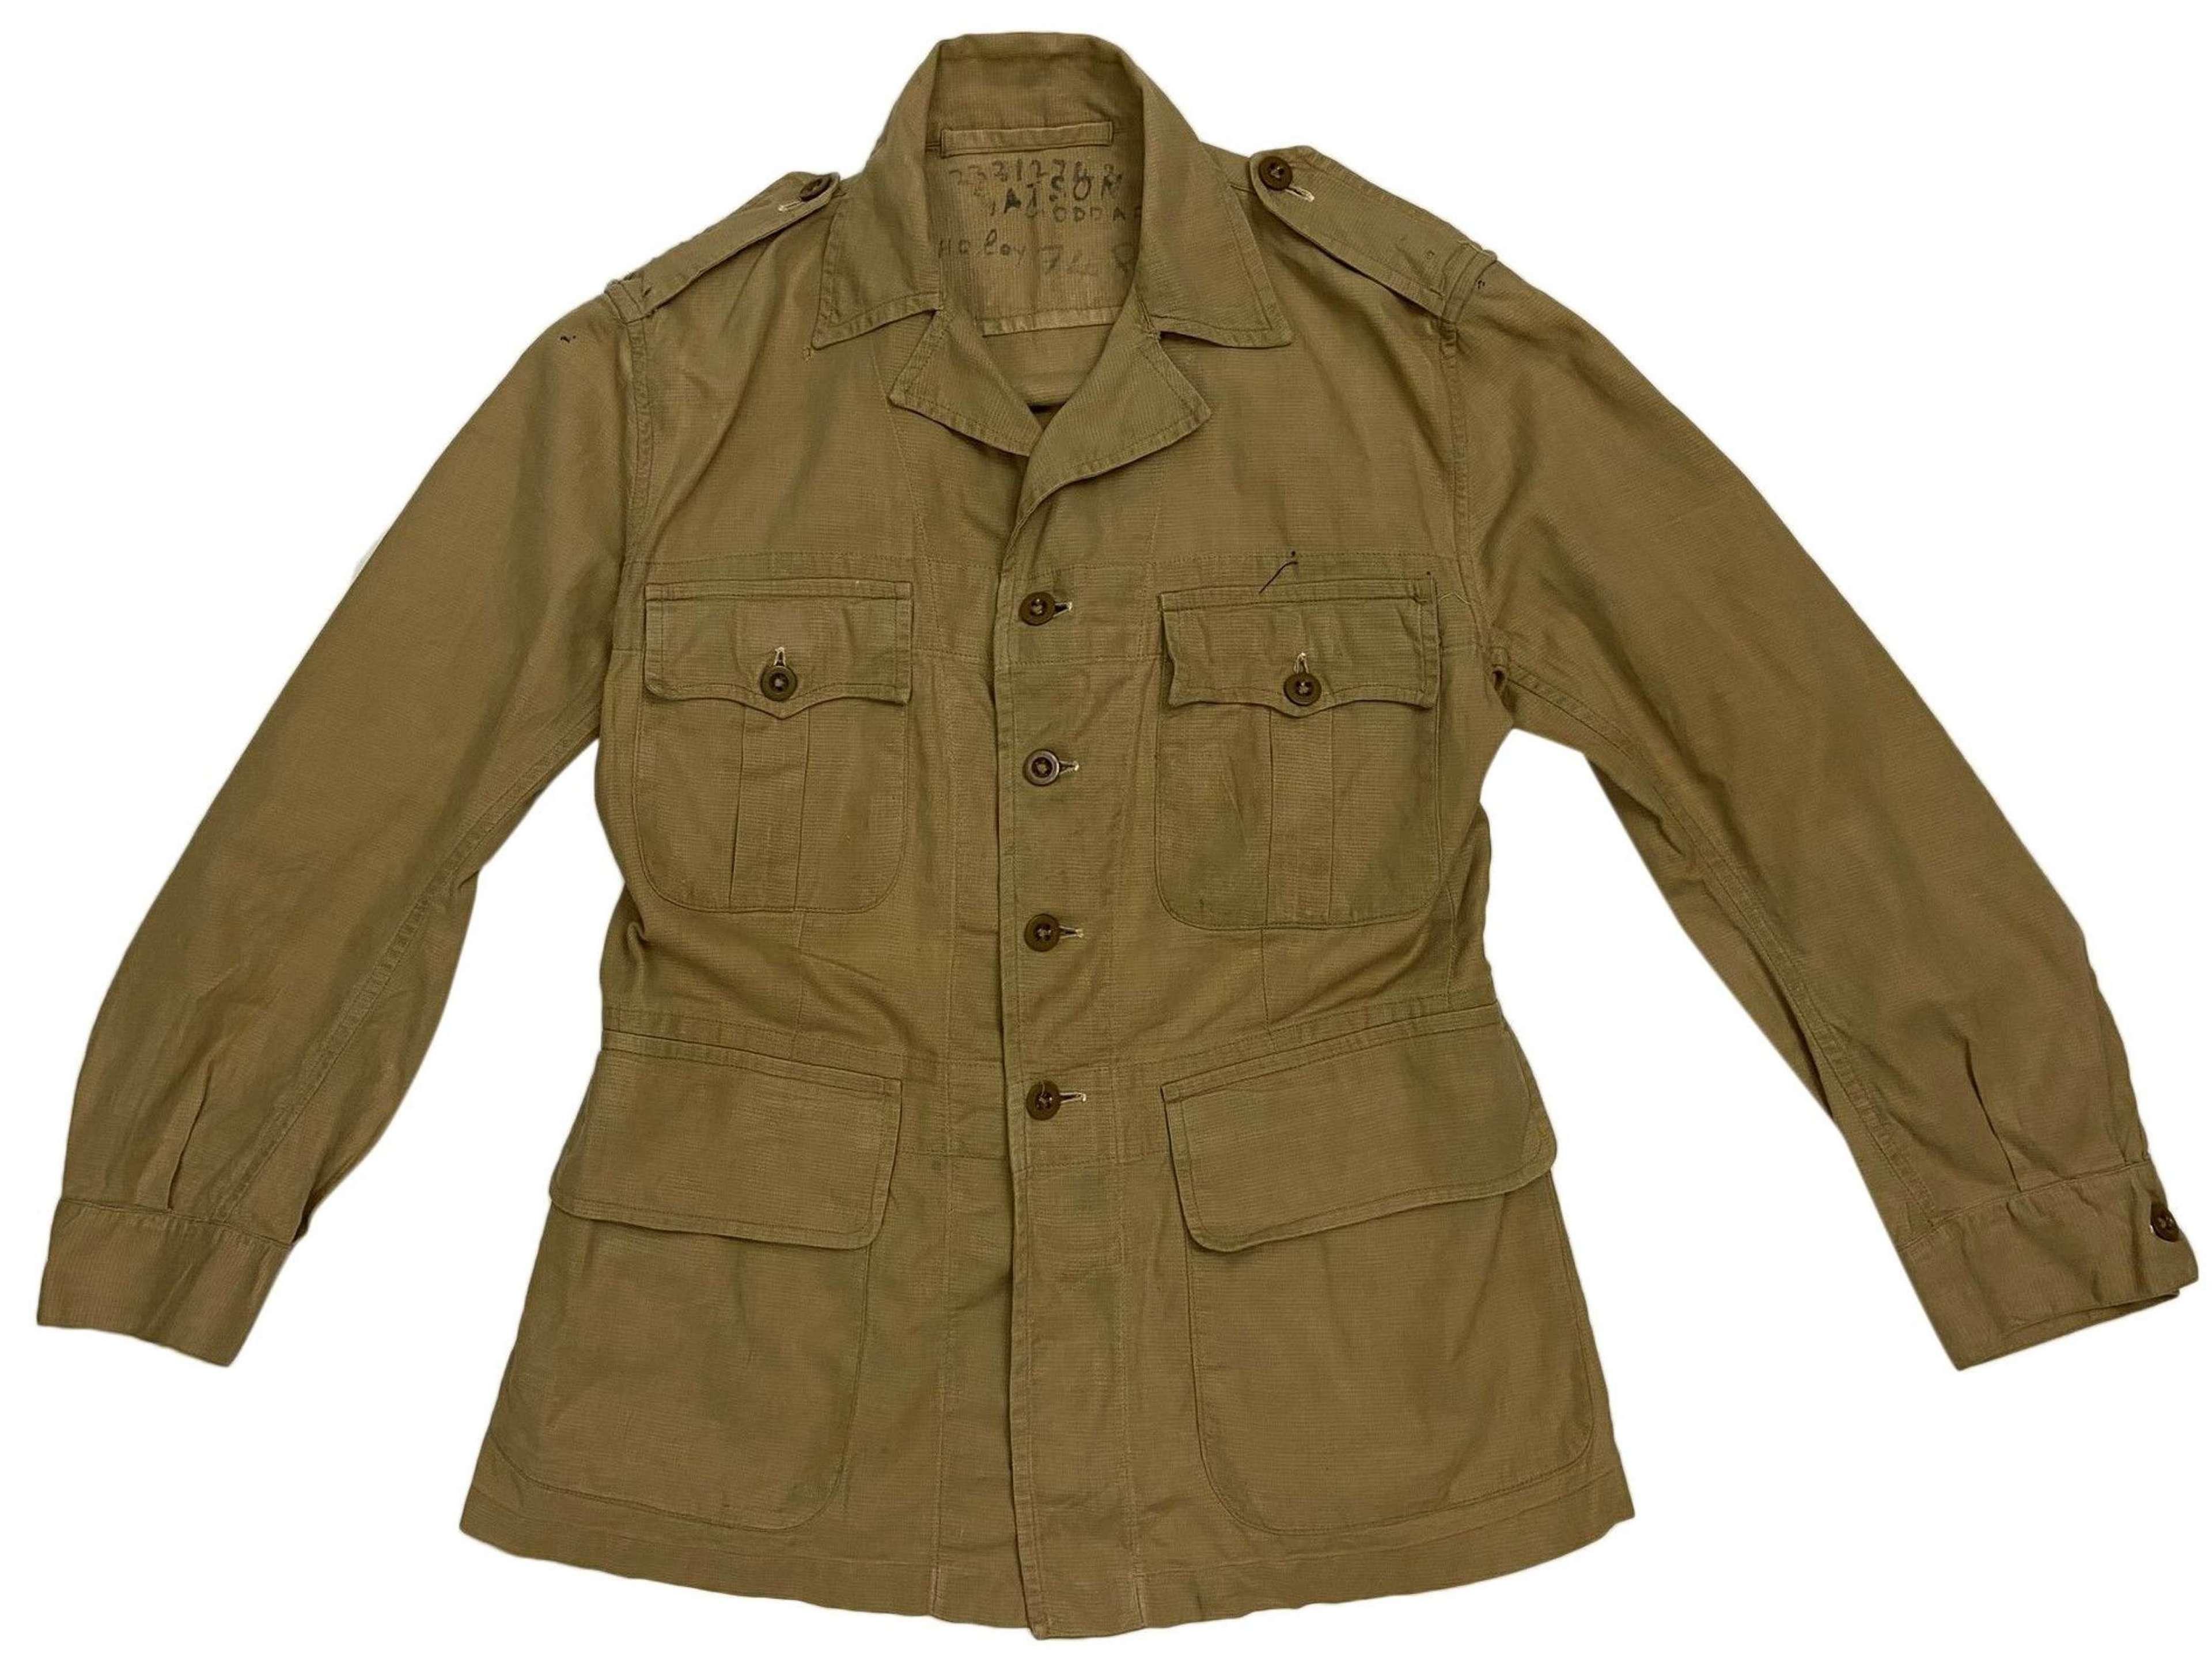 Original 1953 Dated British 1950 Pattern Bush Jacket - Size 5